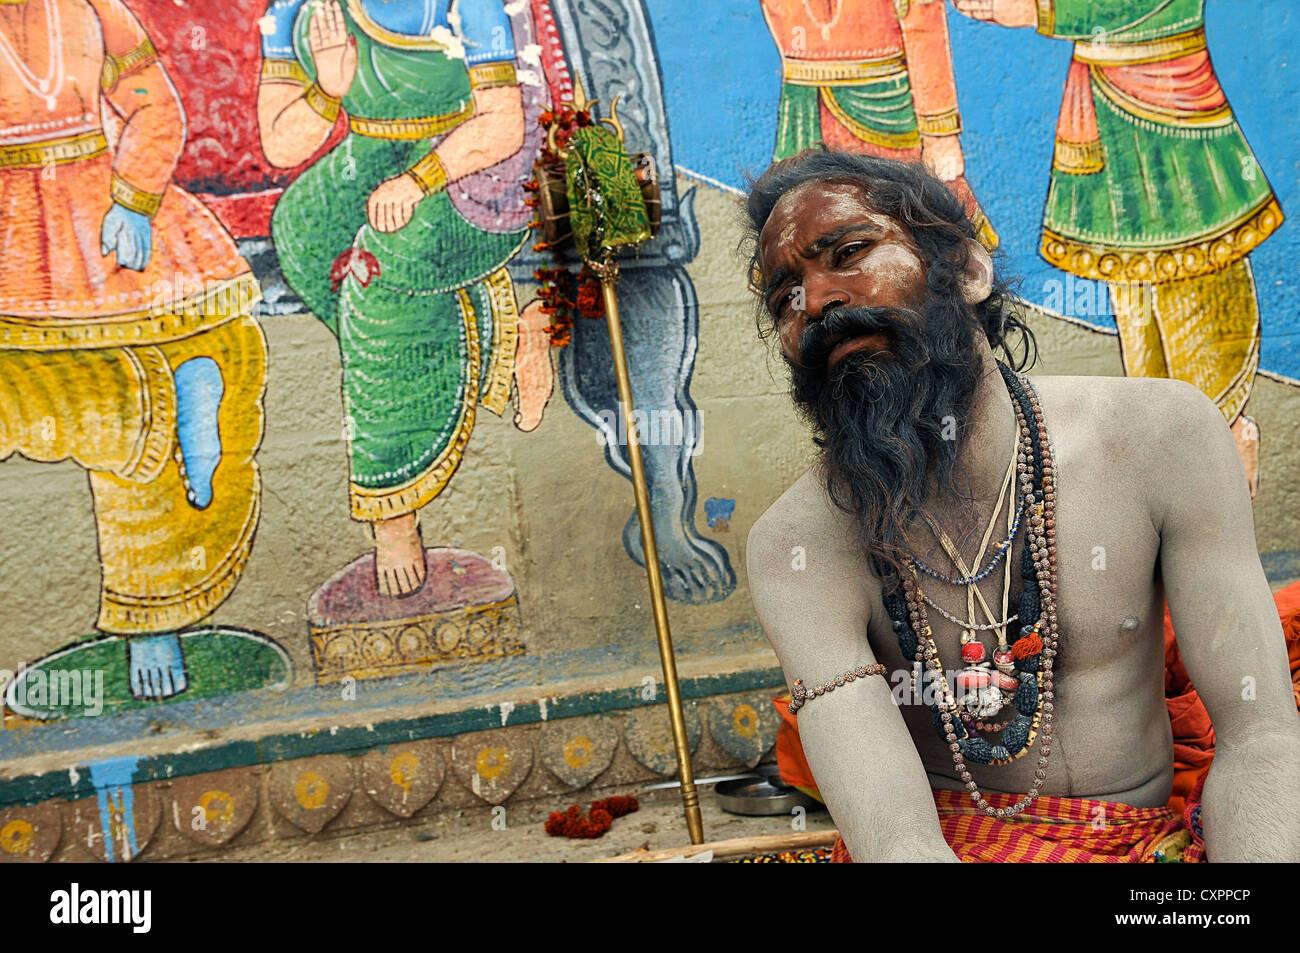 Asia India Uttar Pradesh Varanasi Portrait of a sadhu or ascetic - Stock Image